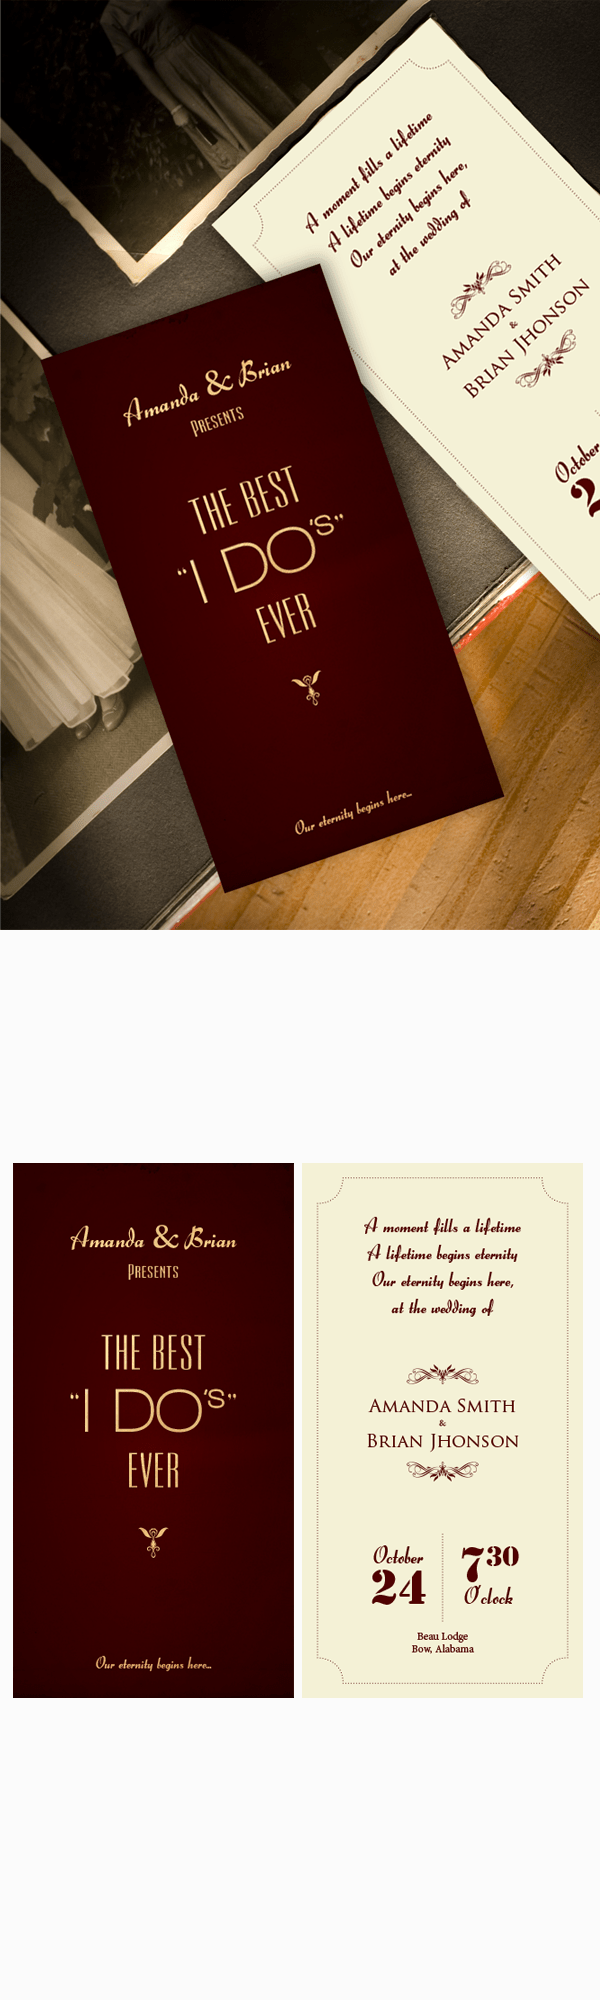 wedding invitation inspired by